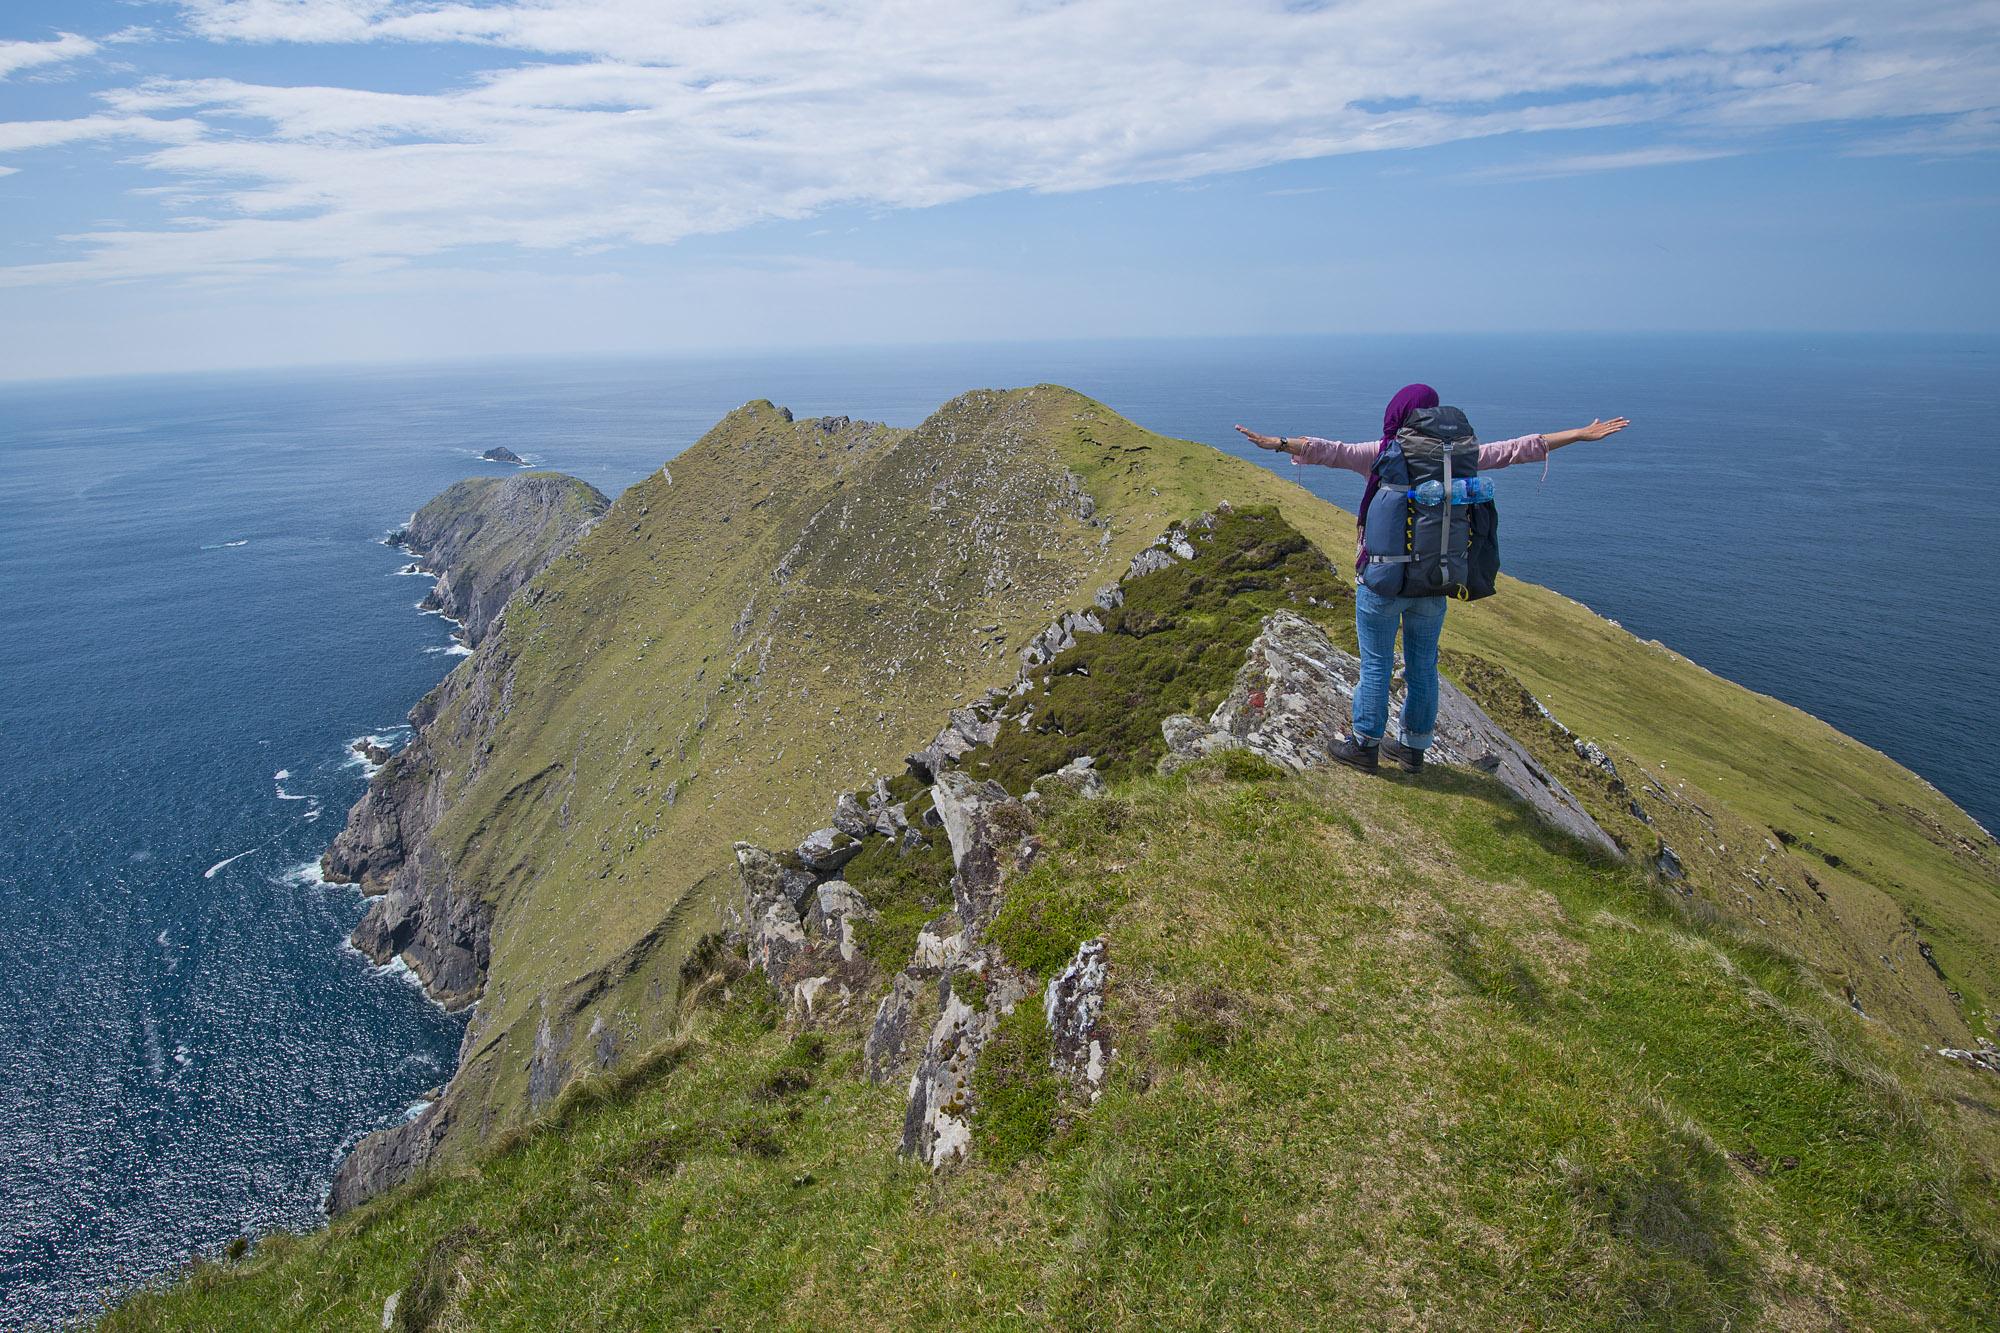 OlafSchubert_Irland_Connemara_Achill Island_Wanderin am Achill Head